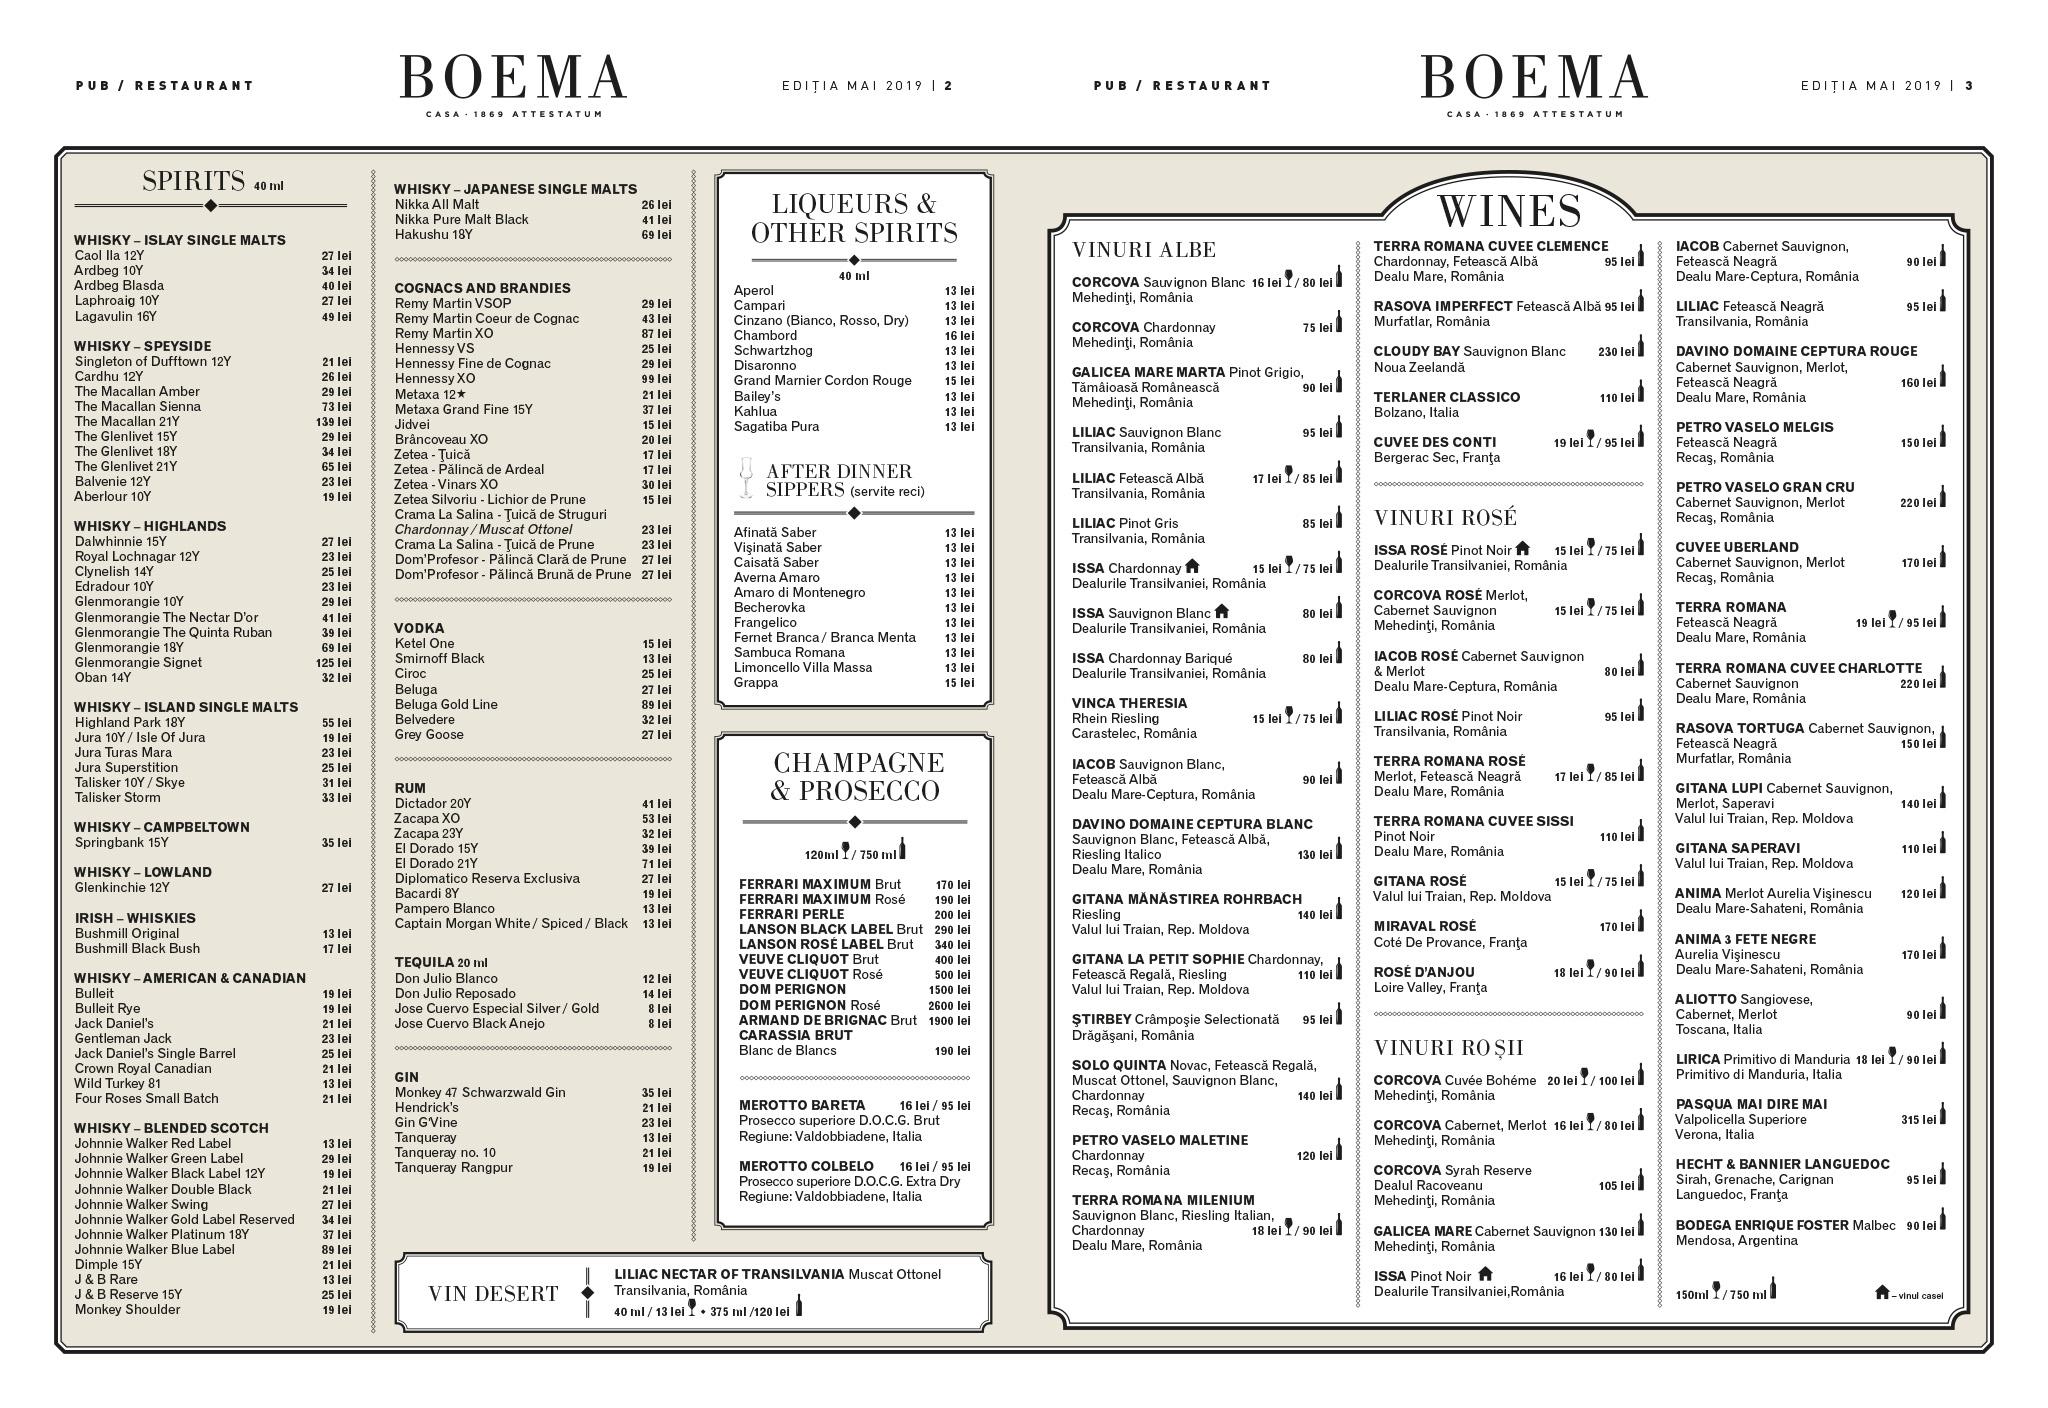 restaurant-cluj-napoca-casa-boema-meniu-bautura-2019-vara-2